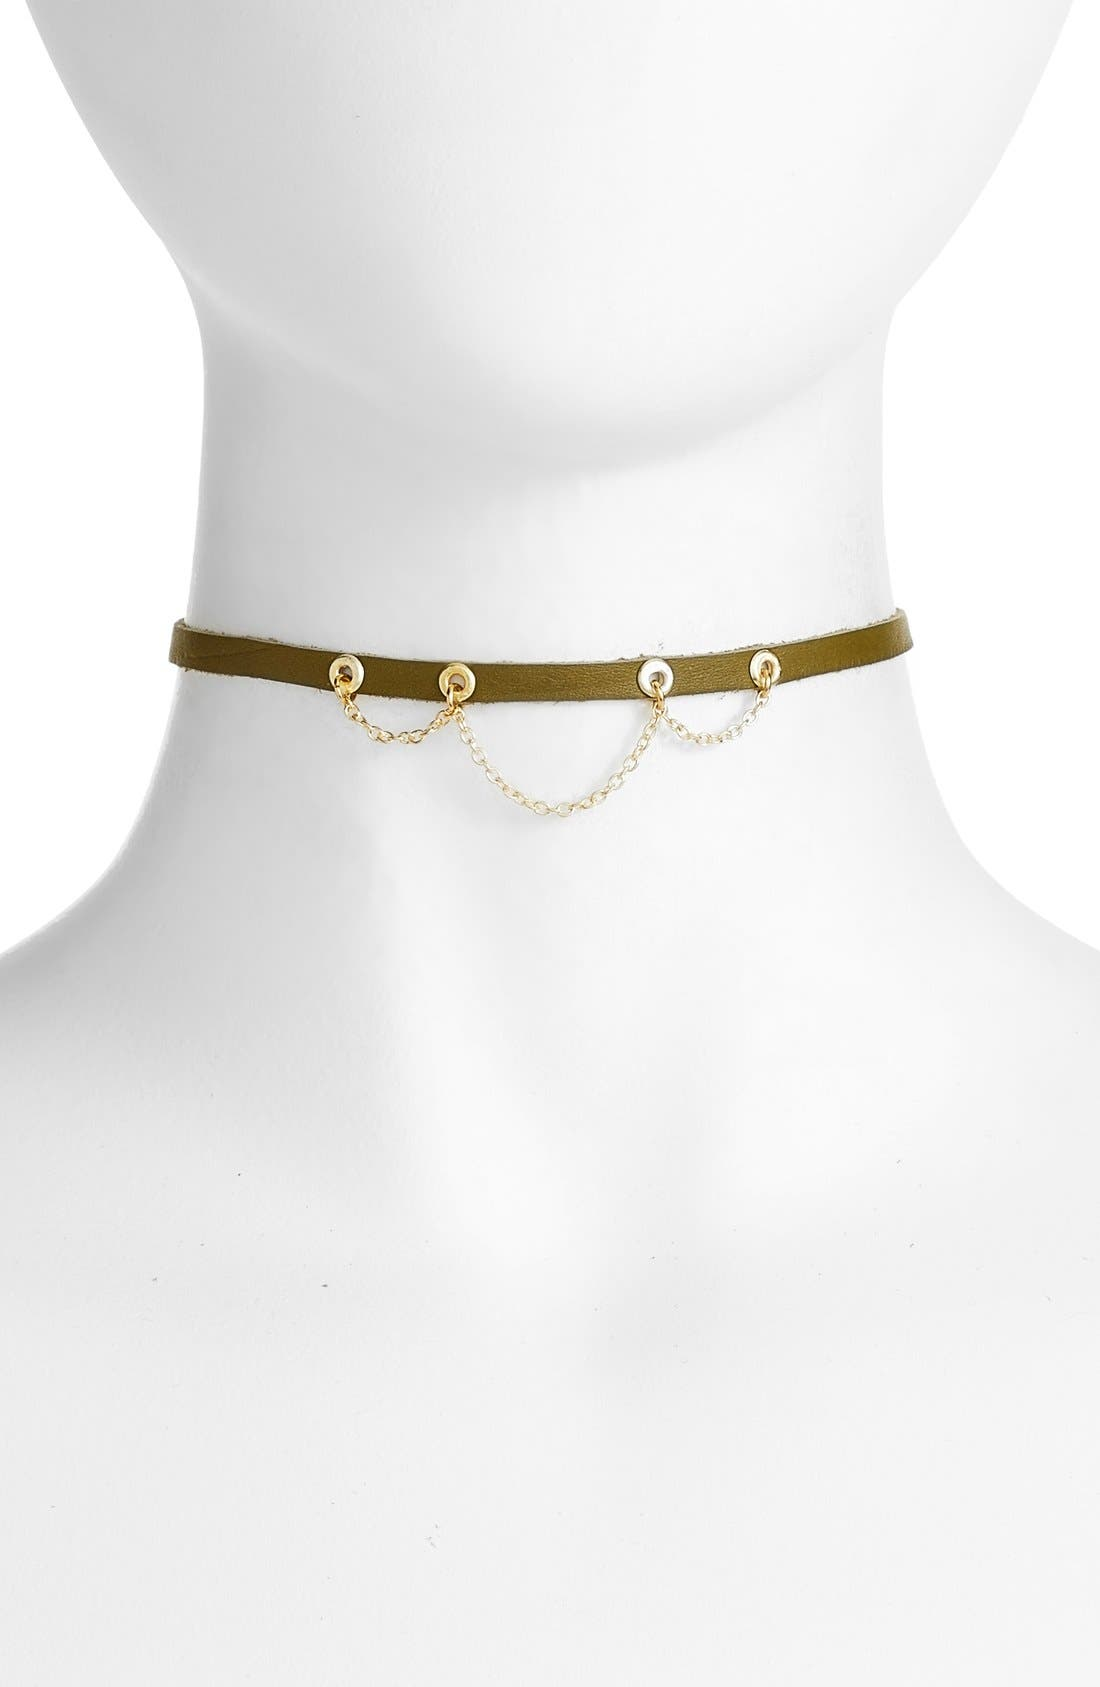 Nashelle Leather & Chain Choker